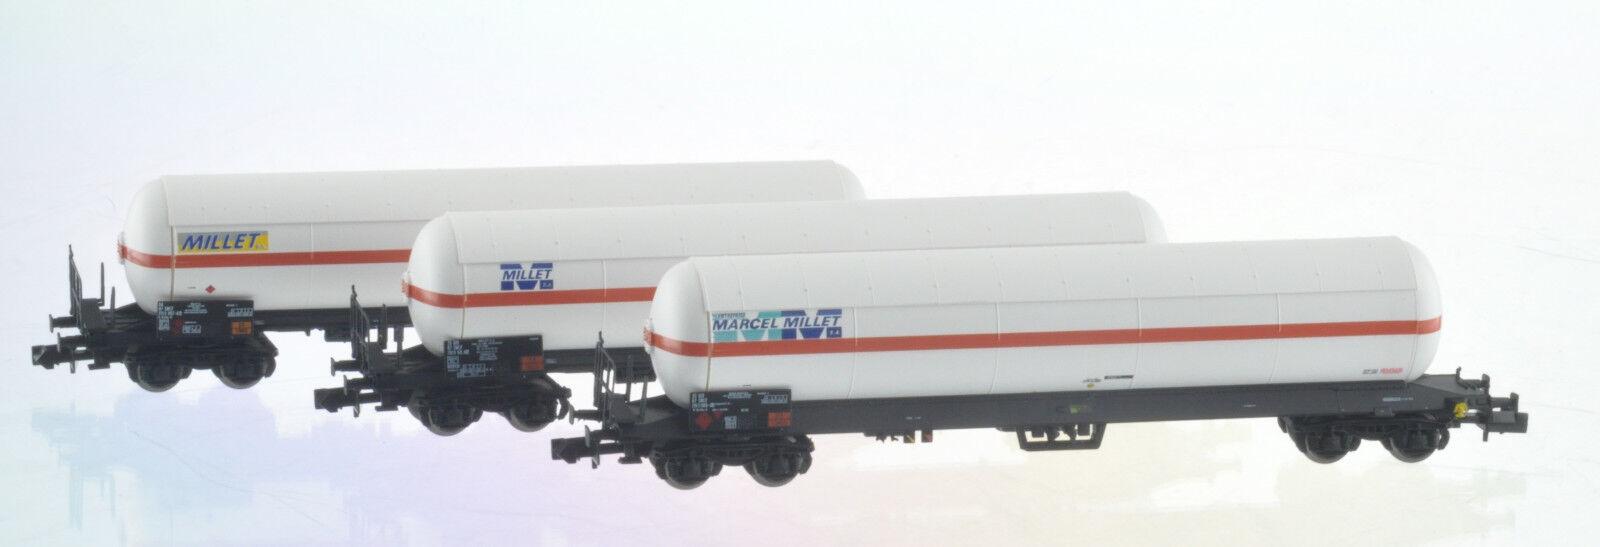 Ls modellolo 60136 Set 3x SNCF 4achs Kesselwag Uas Millet Biancoarancia Ep45 Neu